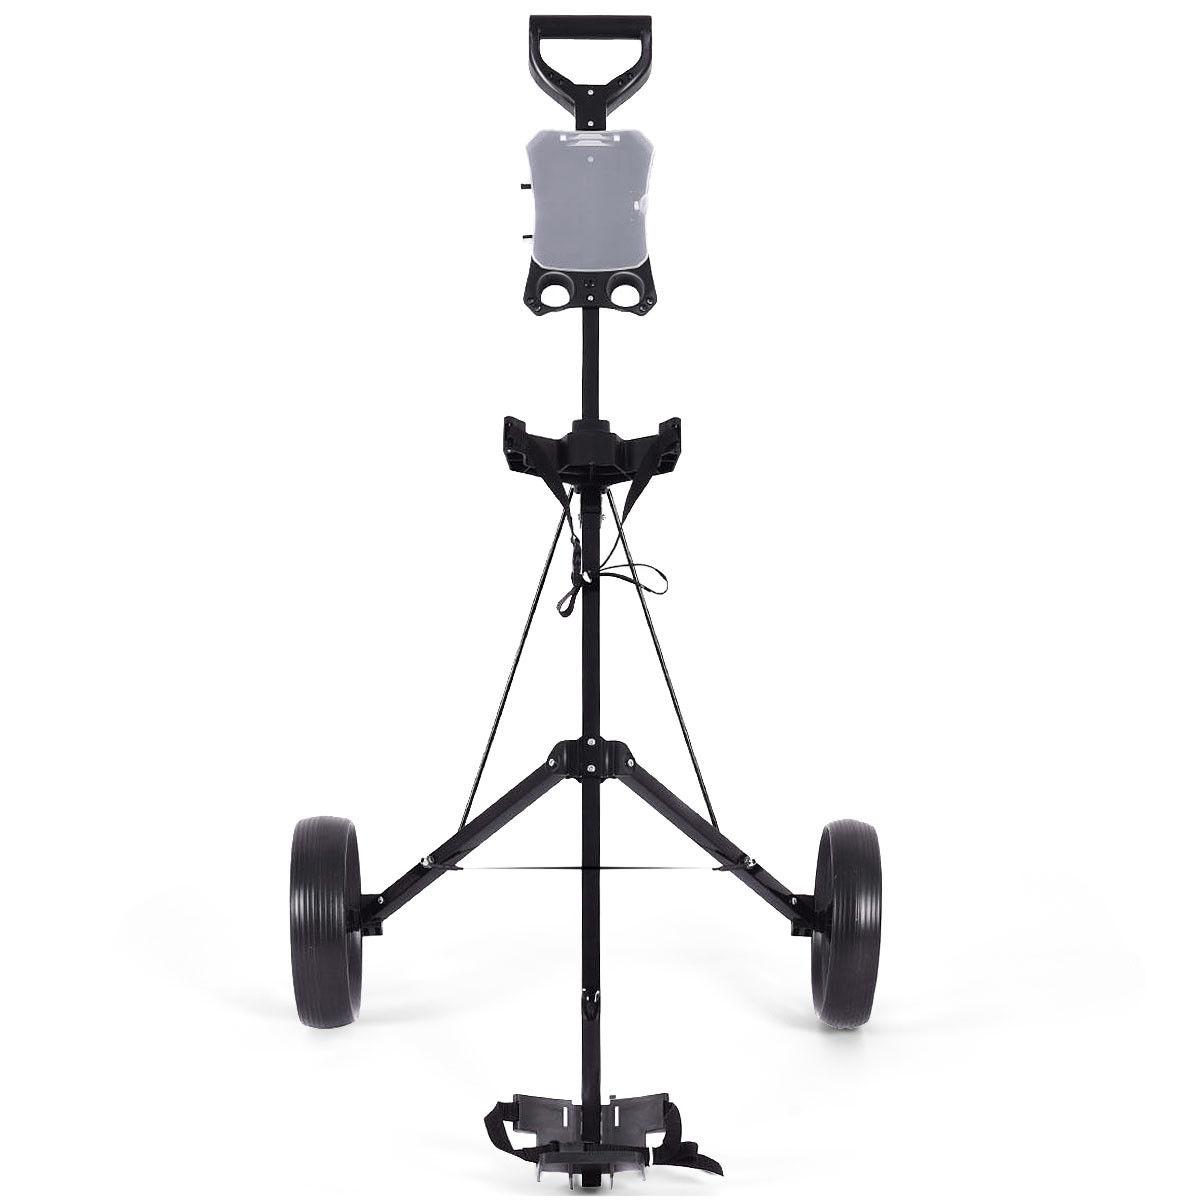 Folding 2 Wheels Push Pull Golf Cart Trolley with Scoreboard